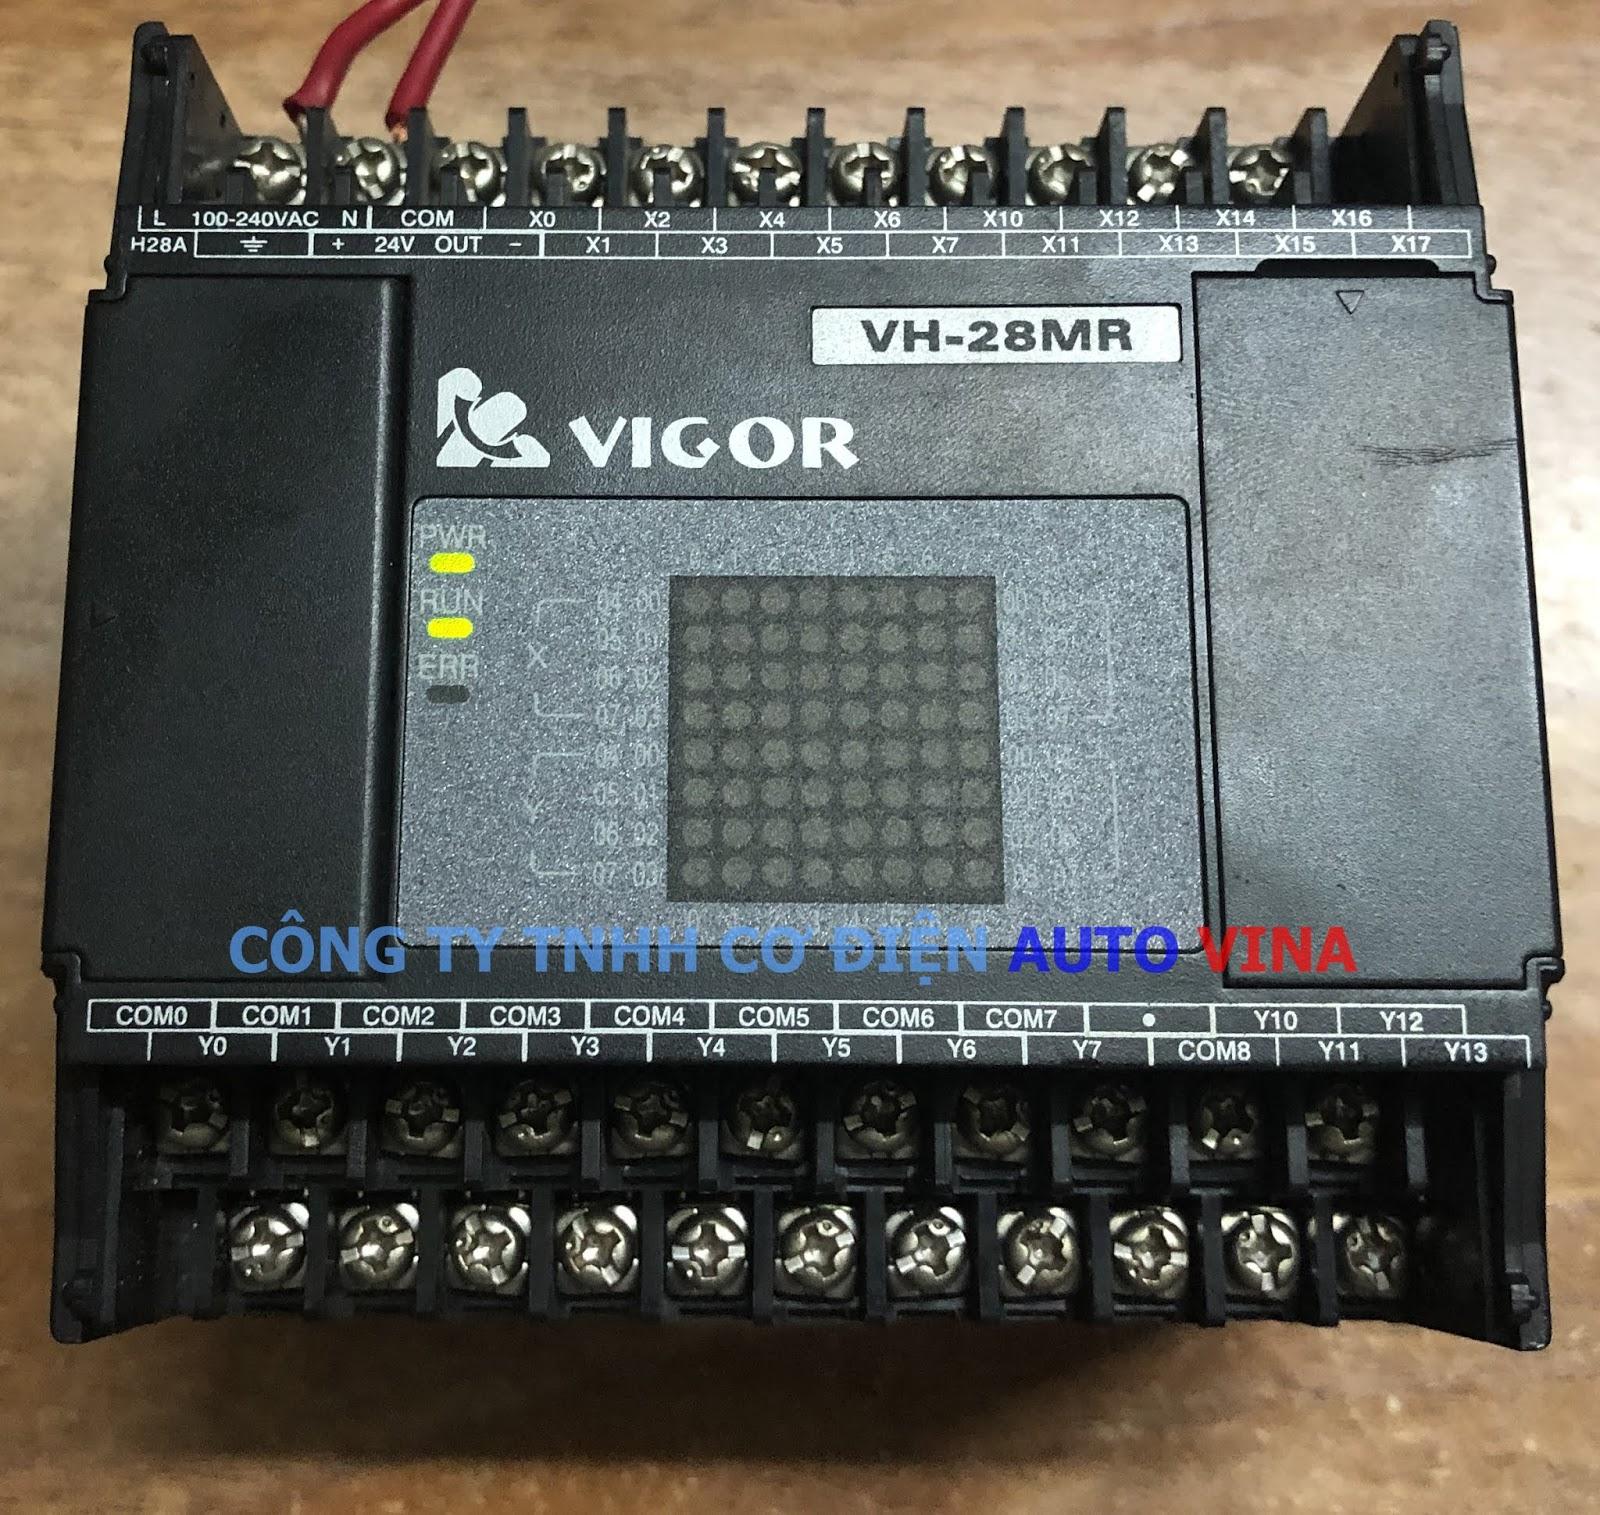 Unlock password PLC Vigor VH-28MR, crack password PLC Vigor VH-28MR